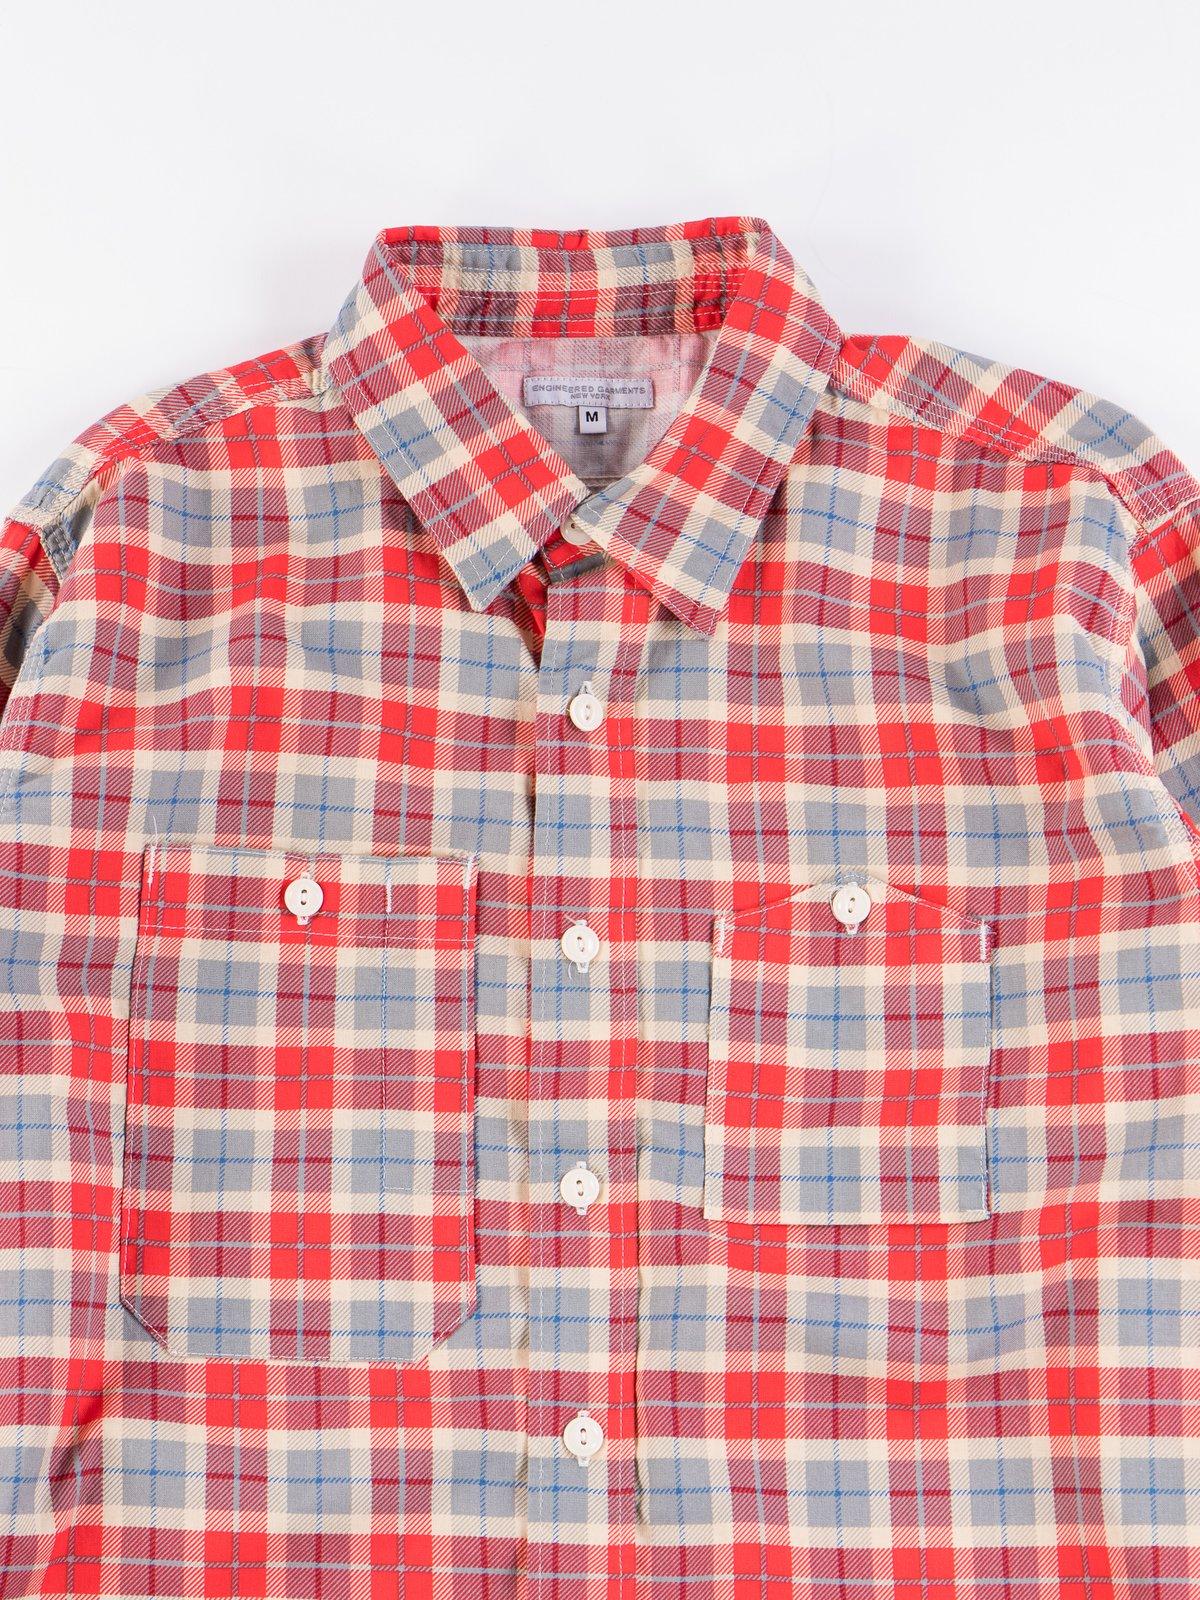 Red/Beige Cotton Printed Plaid Work Shirt - Image 4